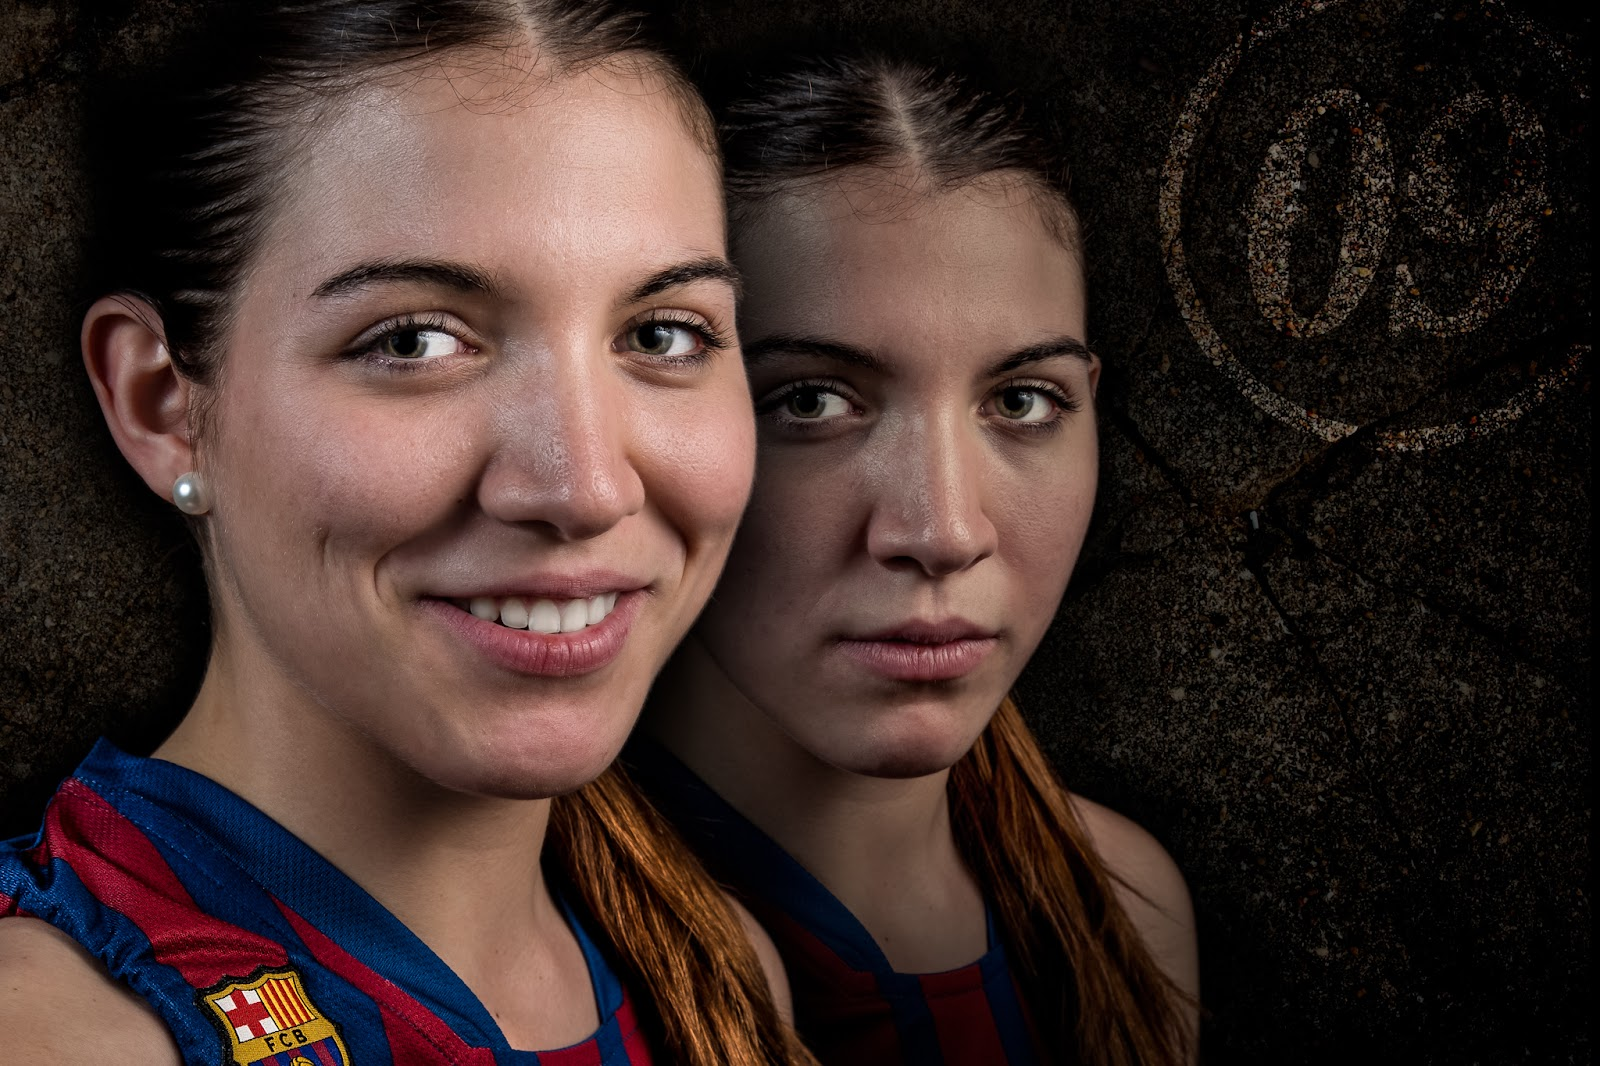 Yaiza 09 - CBS Barça Senior Femenino A - 2013 :: 2 x Canon EOS 5D MkIII | ISO100 | Canon 24-105 @58mm | f/11 | 1/60s